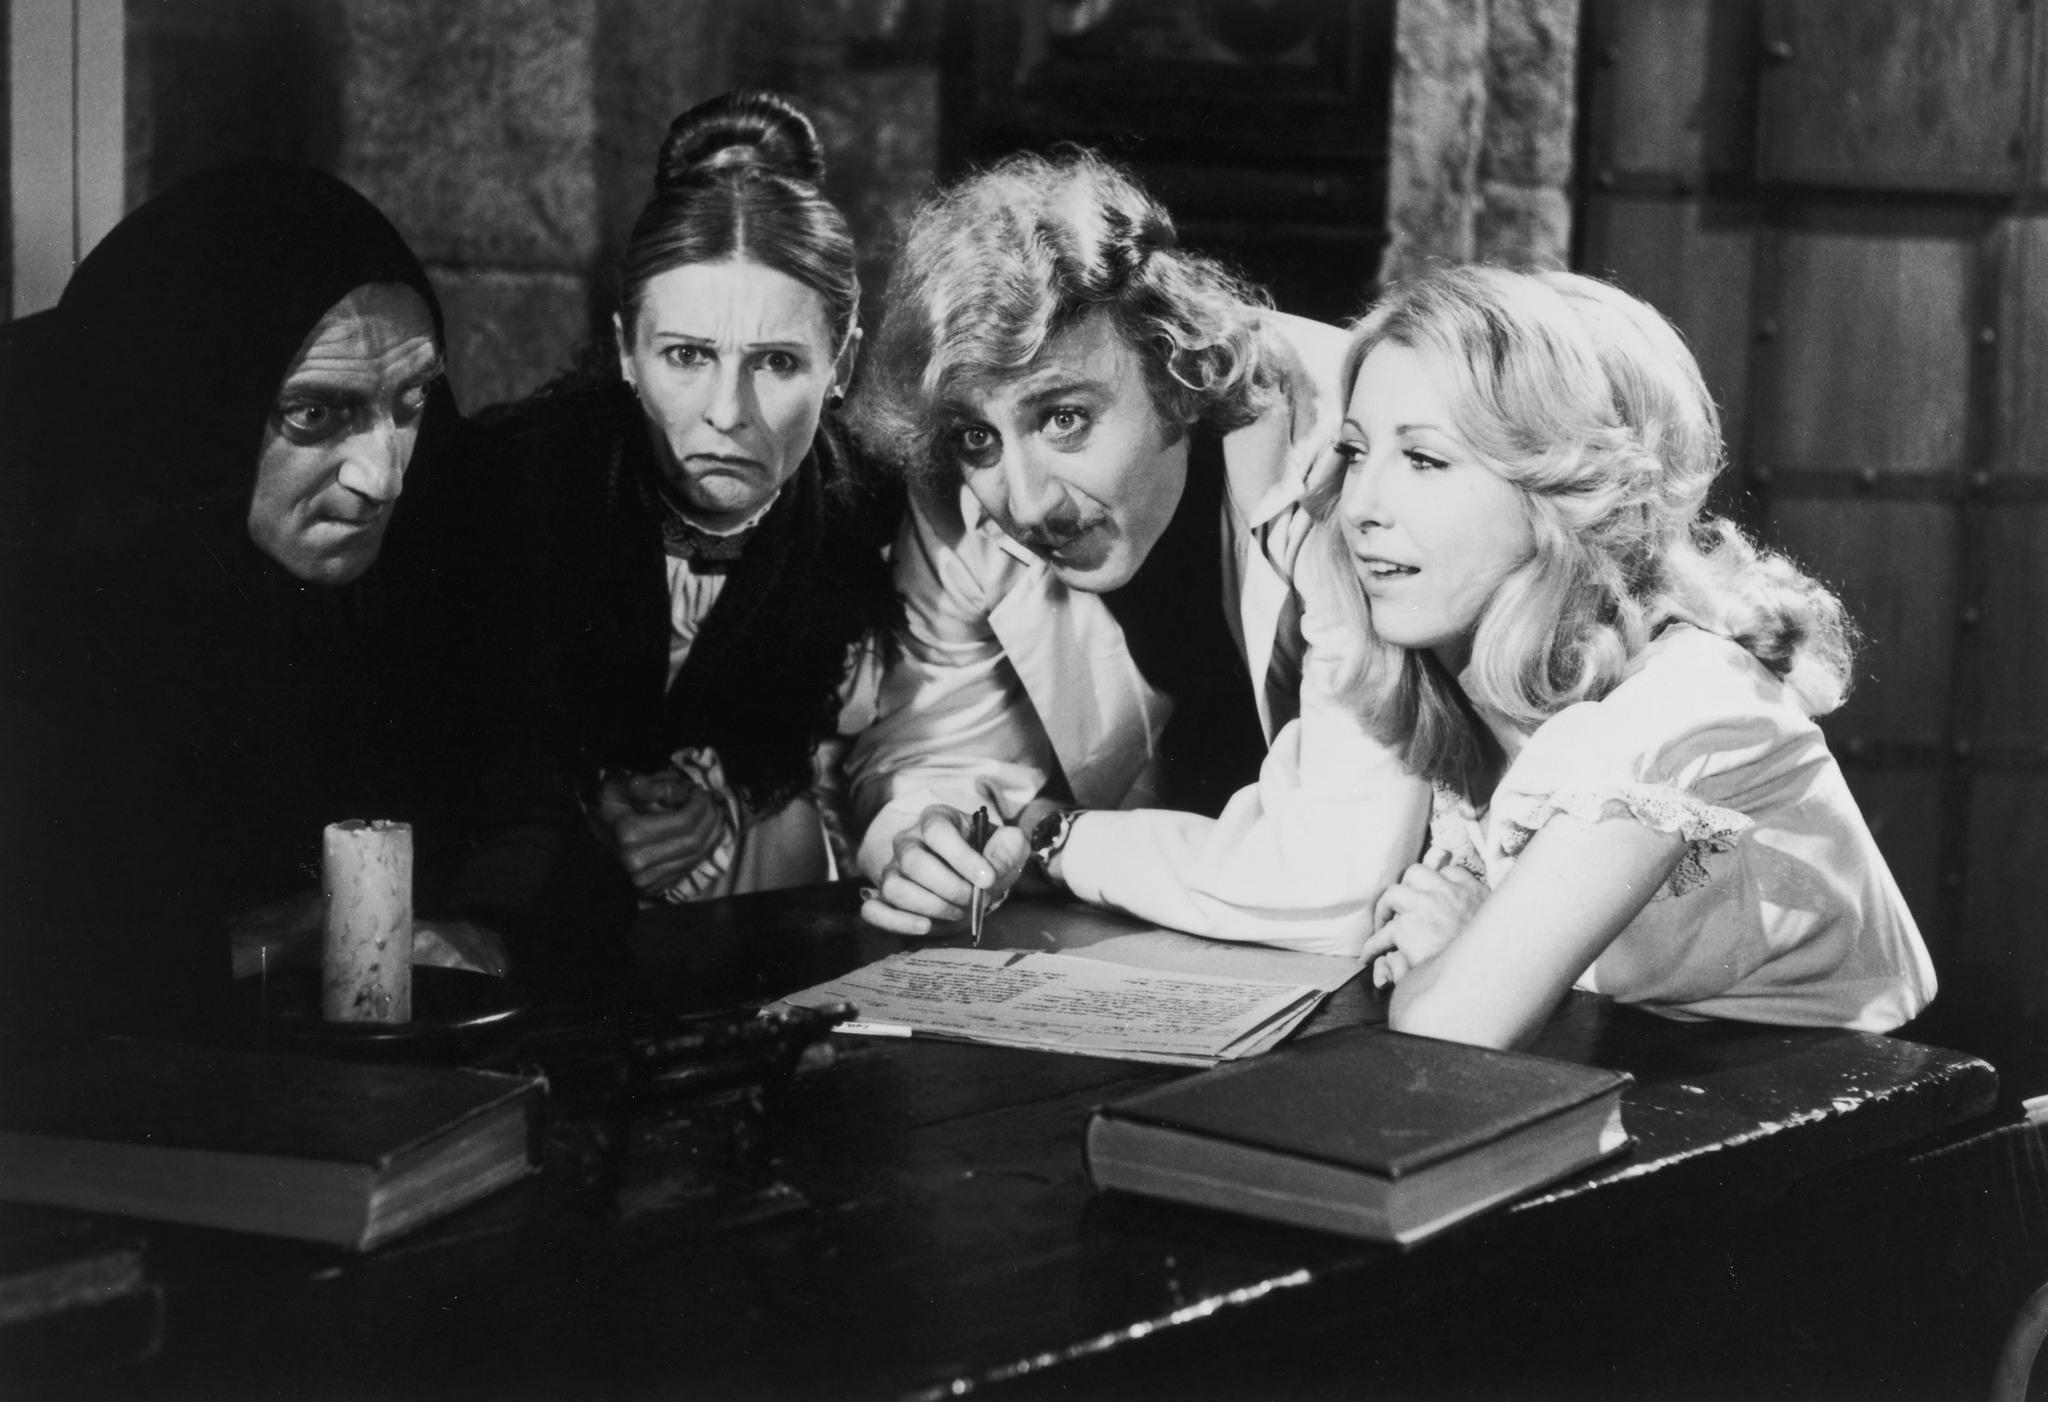 Teri Garr, Gene Wilder, Marty Feldman, and Cloris Leachman in Young Frankenstein (1974)